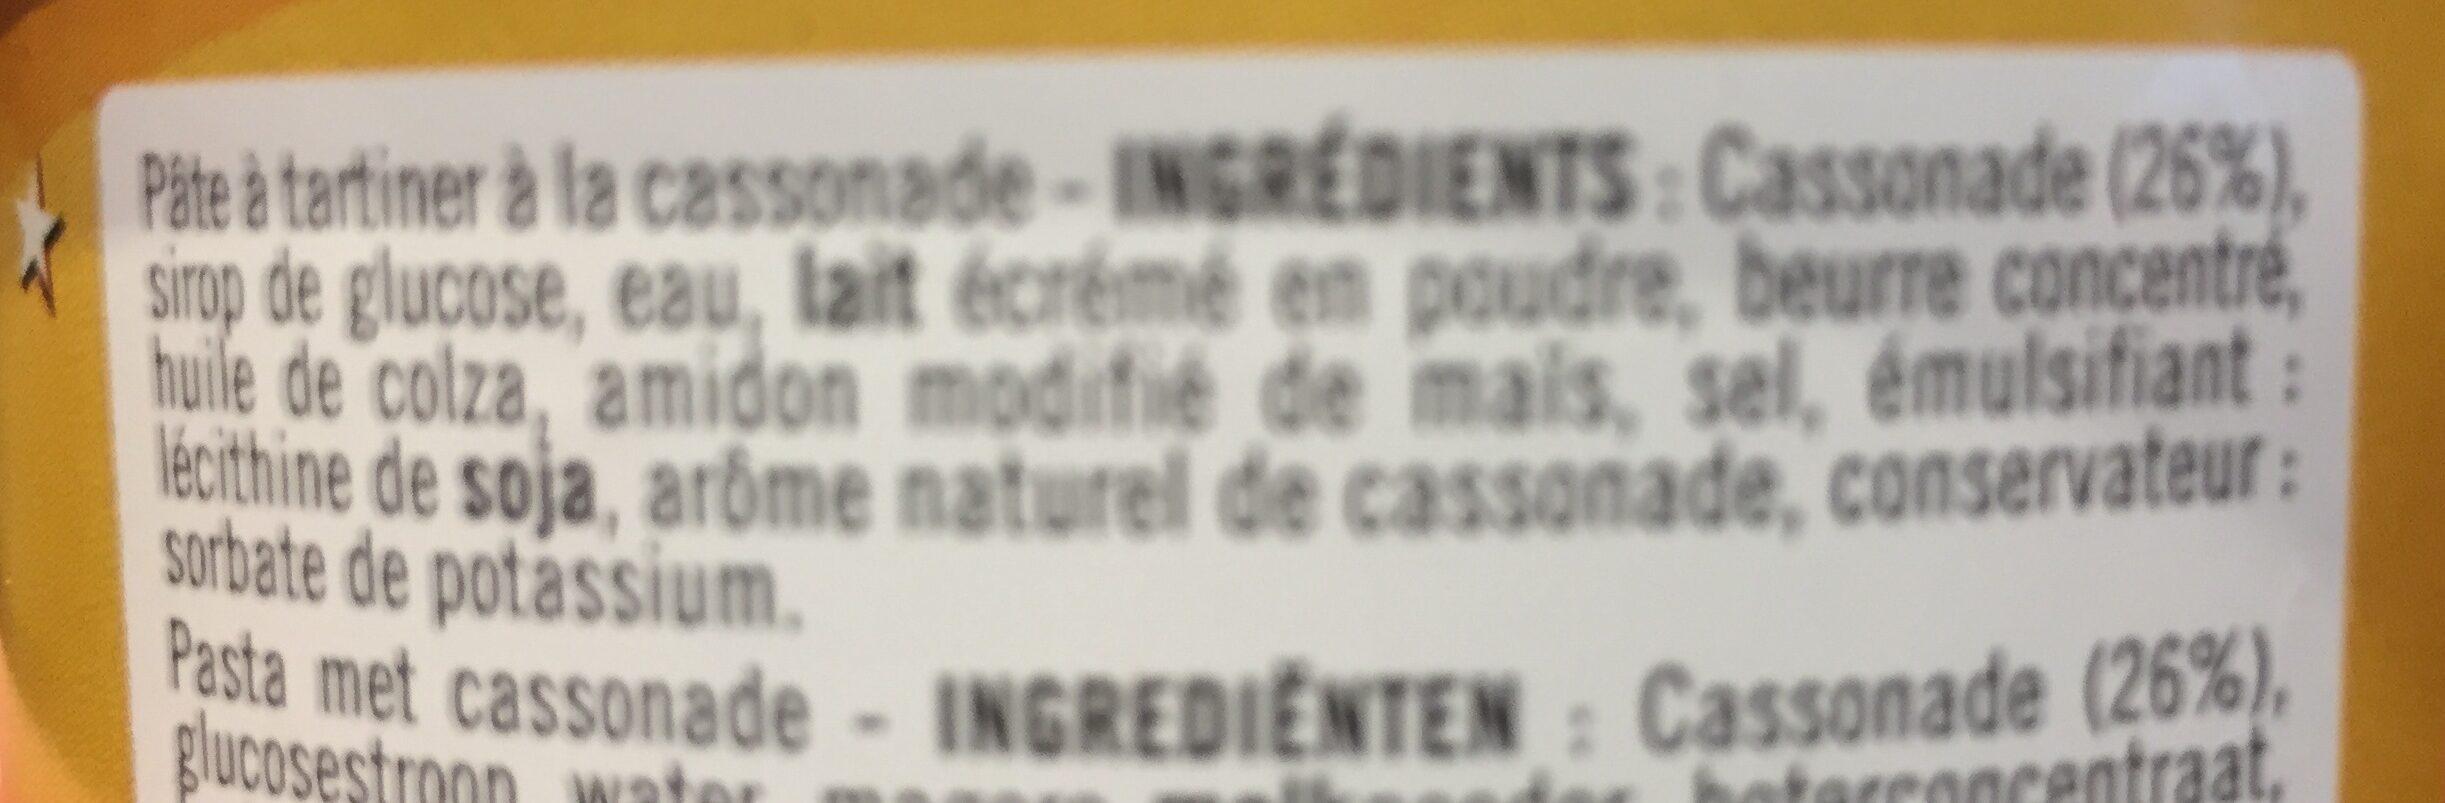 Pate a tartiner a la cassonade - Ingrediënten